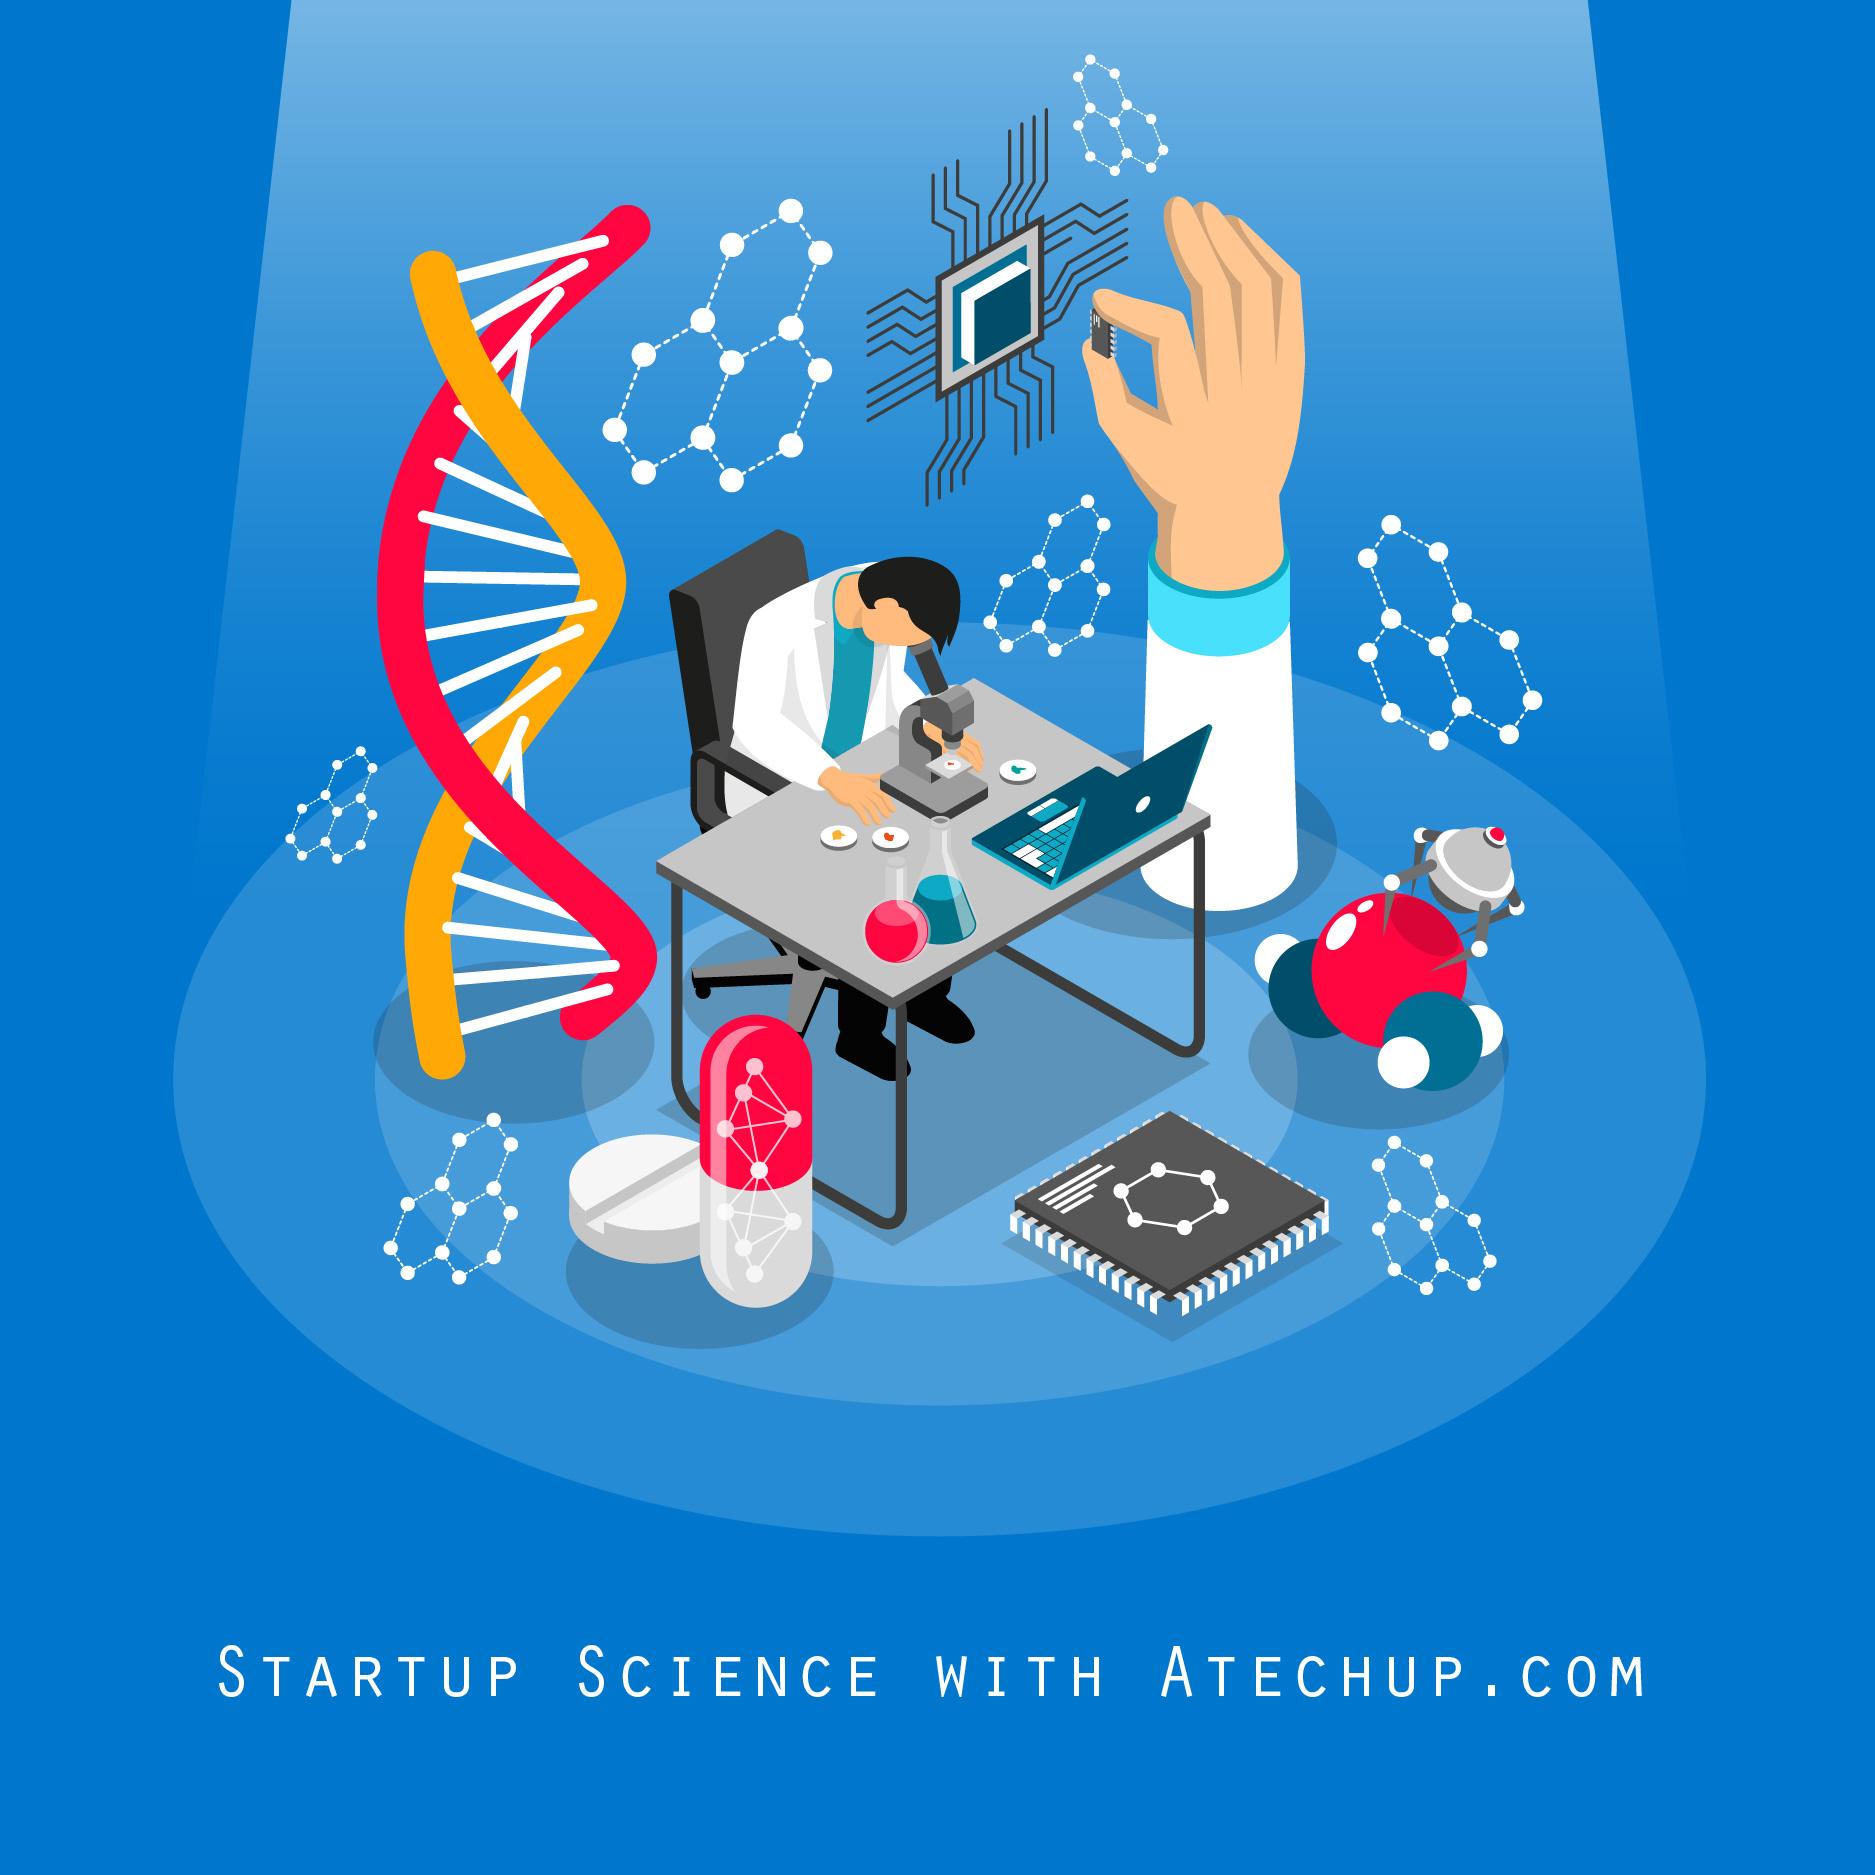 startupscience.jpg